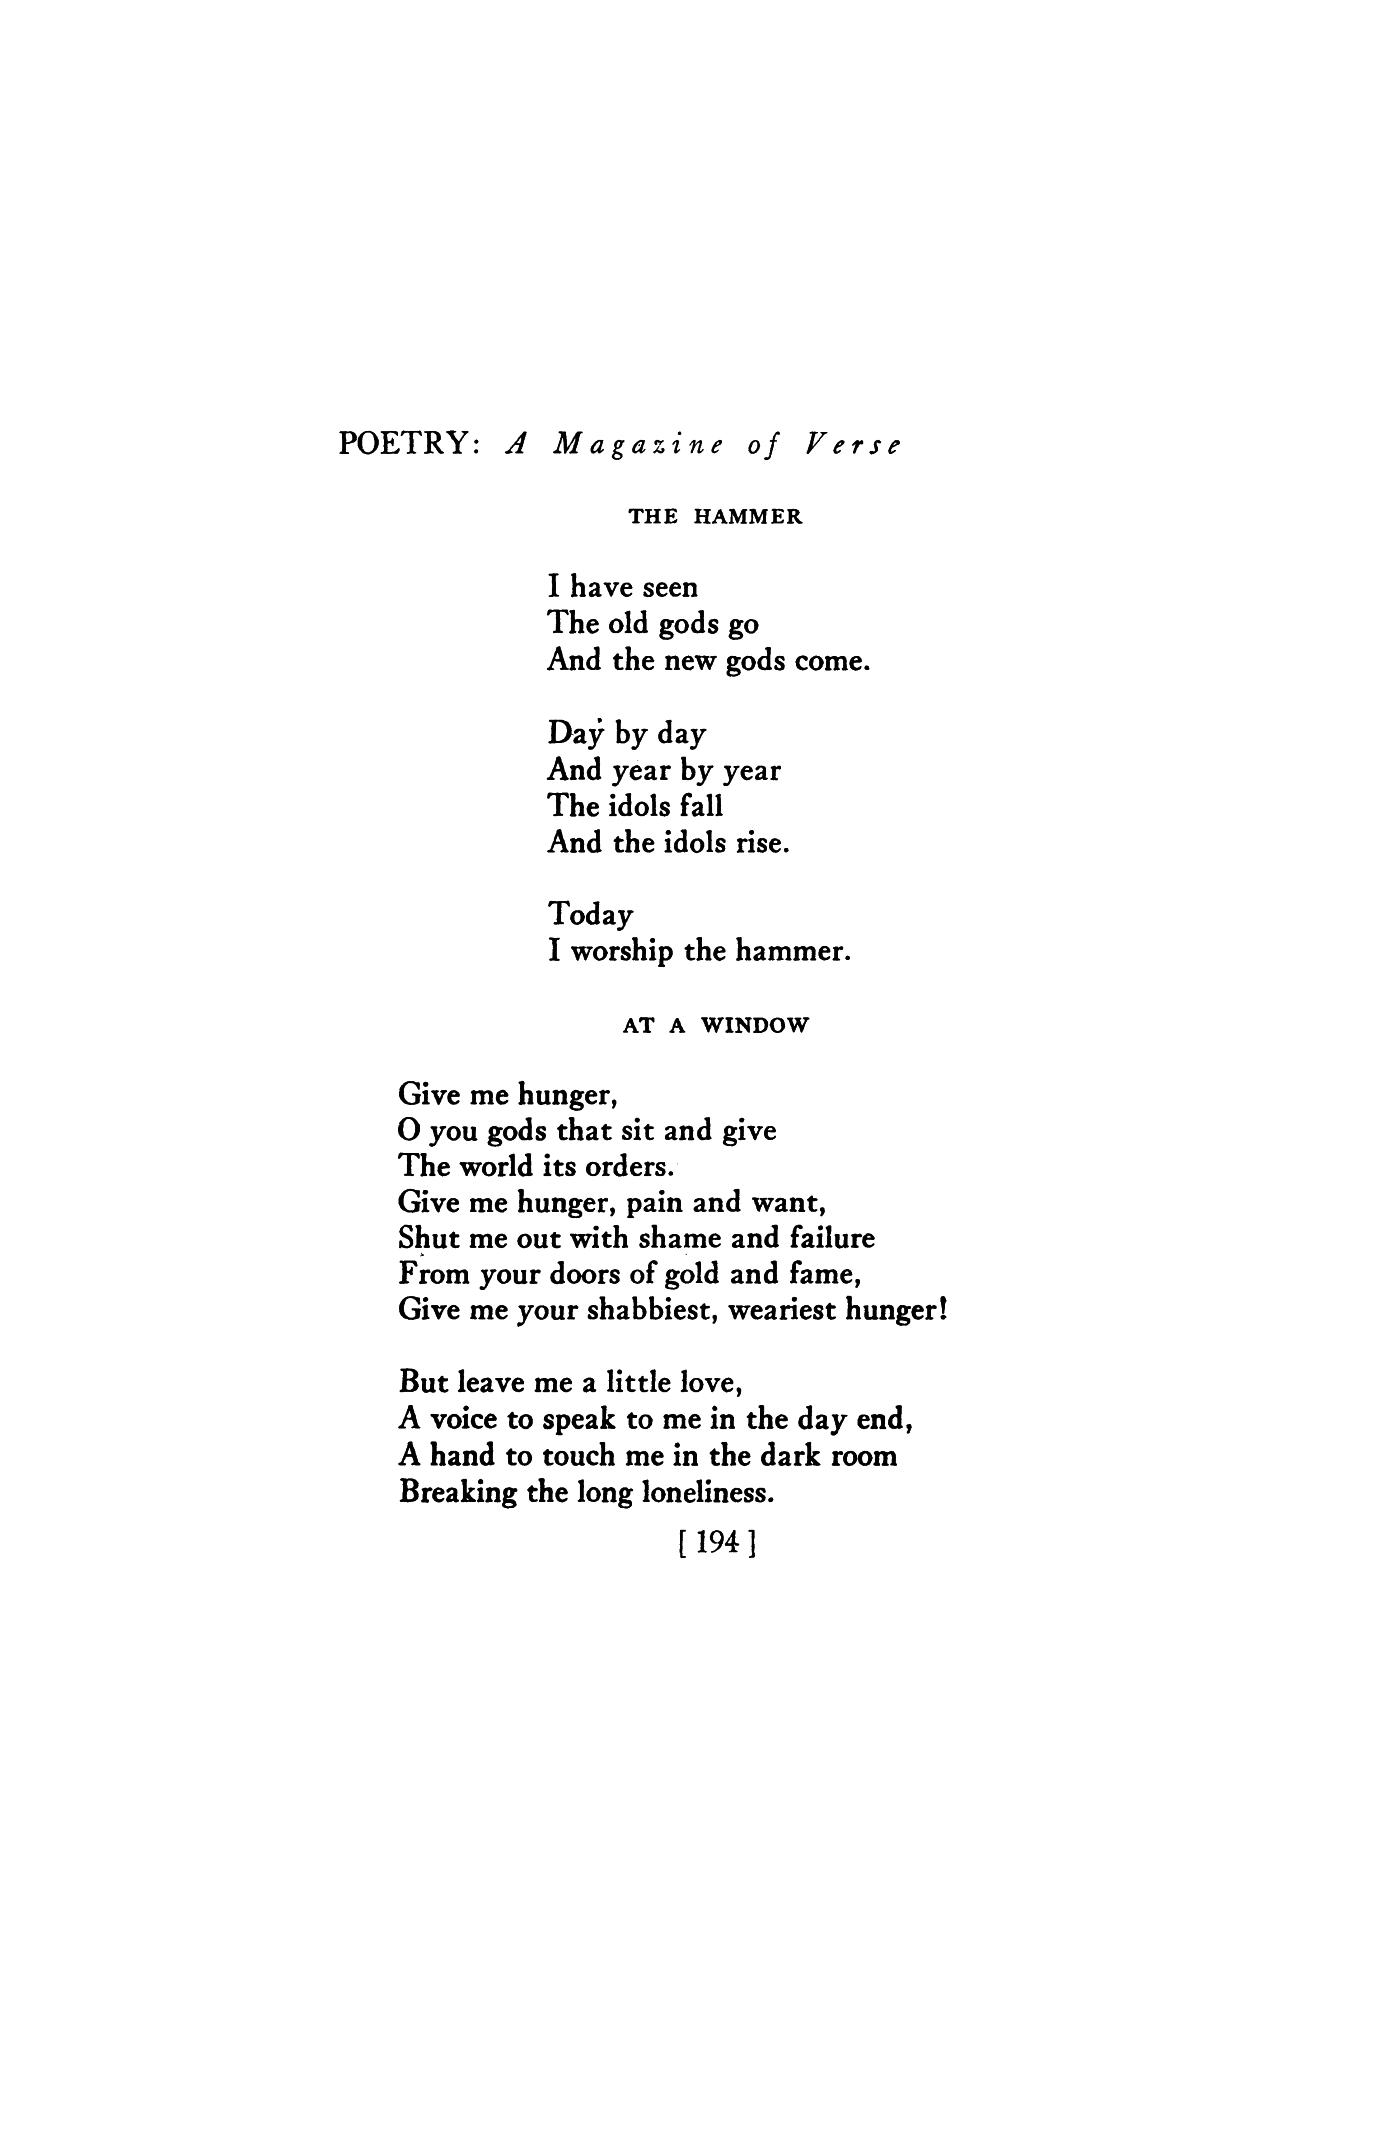 at a window poem analysis